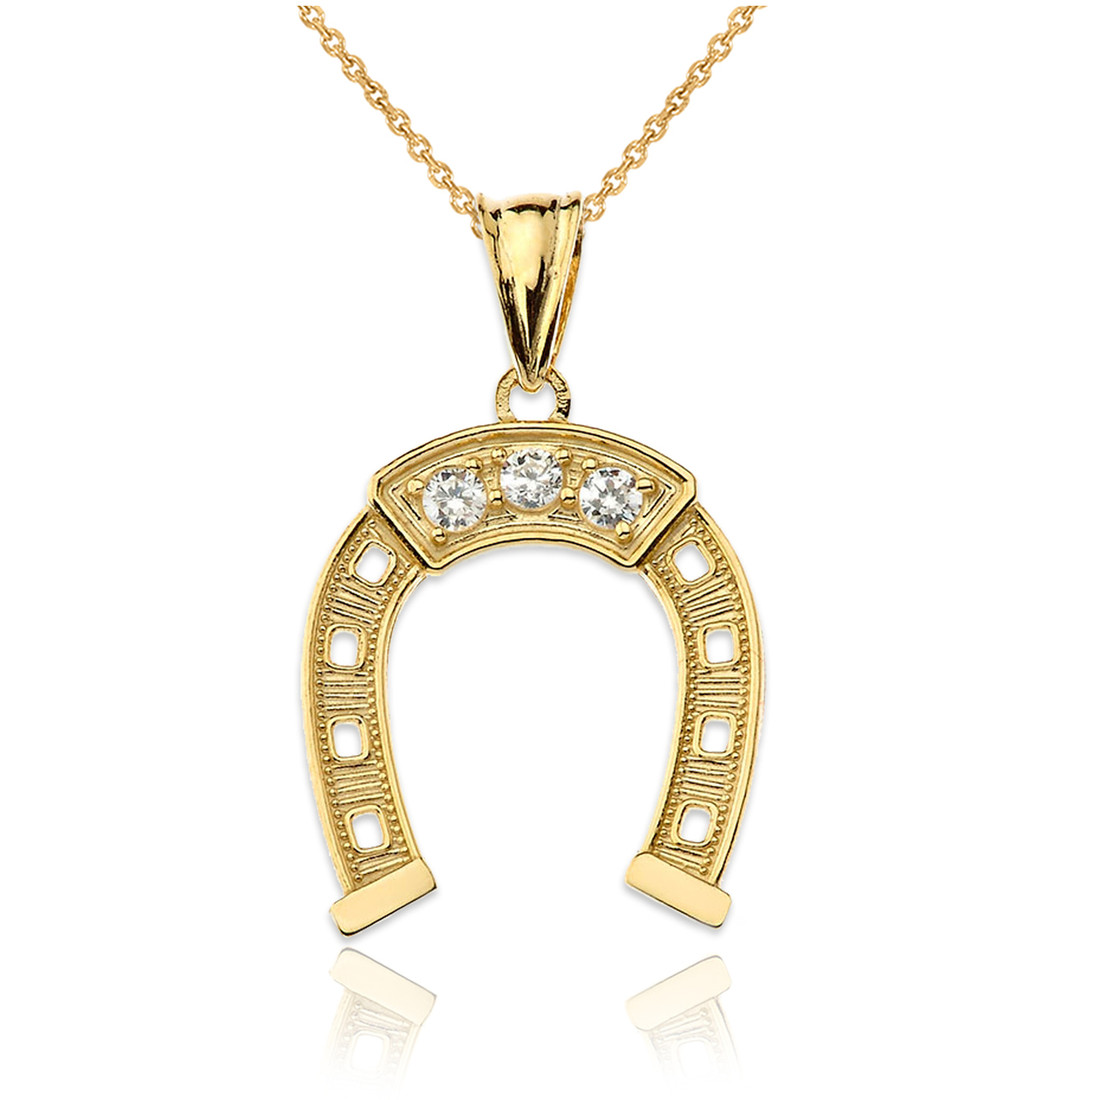 LA BLINGZ 10K Yellow Gold Lucky Horseshoe CZ Pendant Necklace